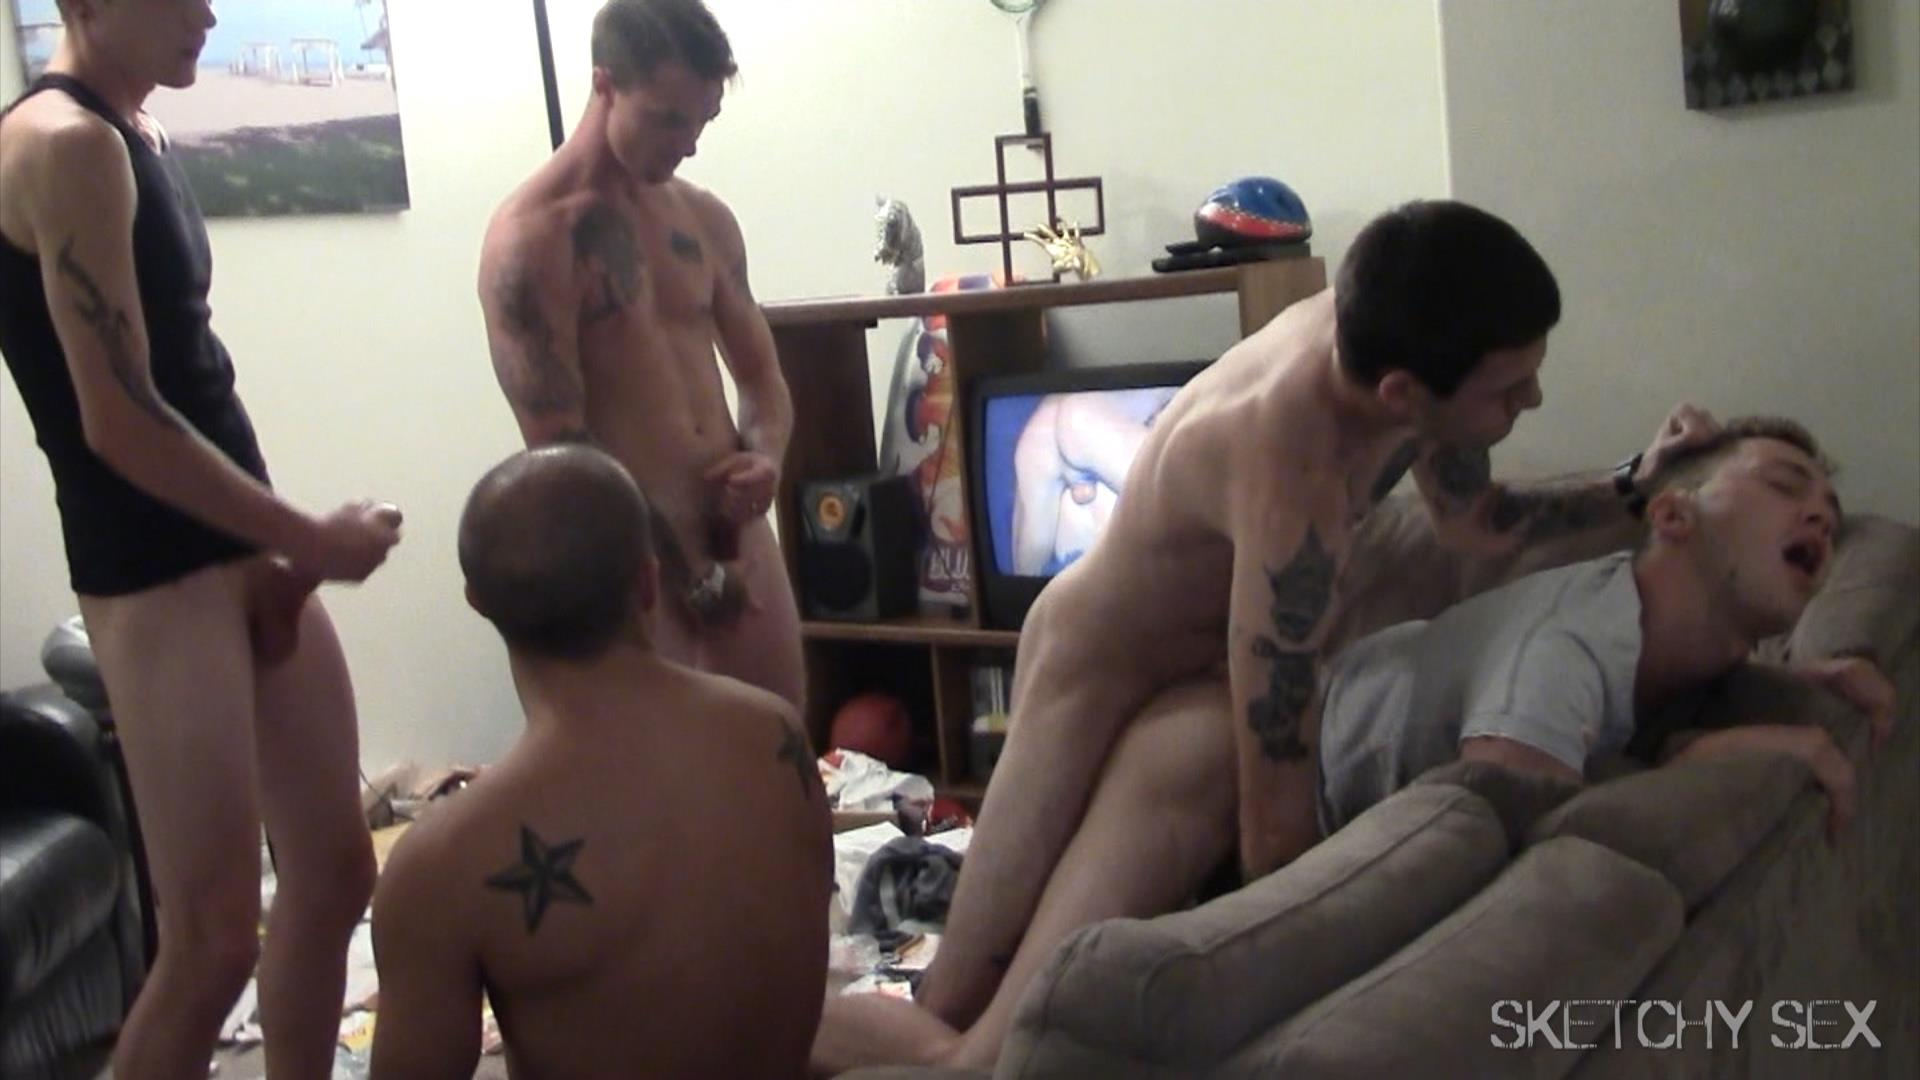 Sketchy-Sex-Bareback-Breeding-Party-Amateur-Gay-Porn-16 Hosting An Anonymous Bareback Breeding Party